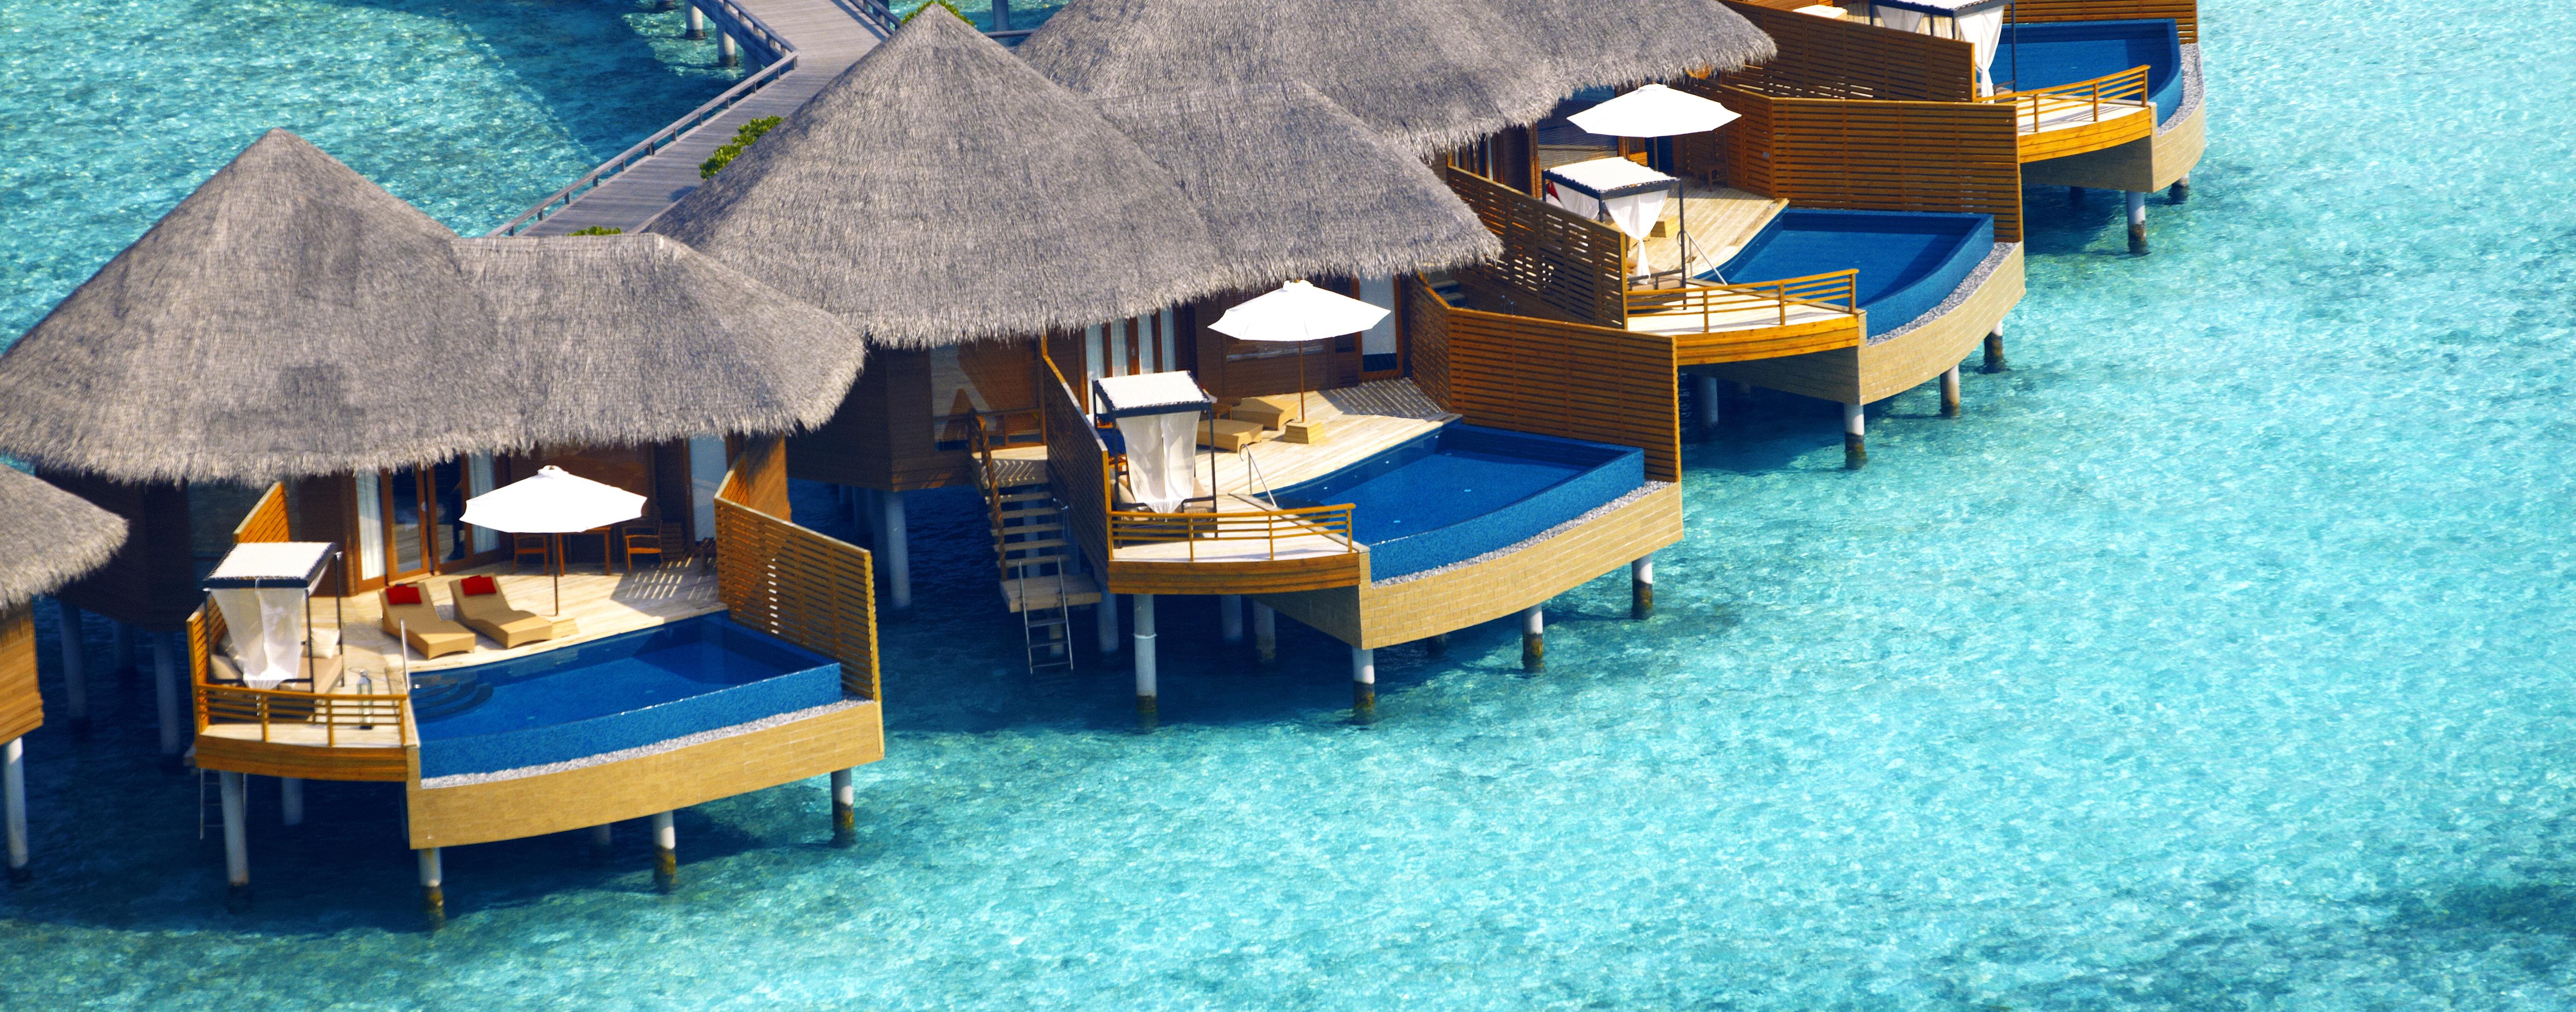 baros-water-pool-villa-aerial-view